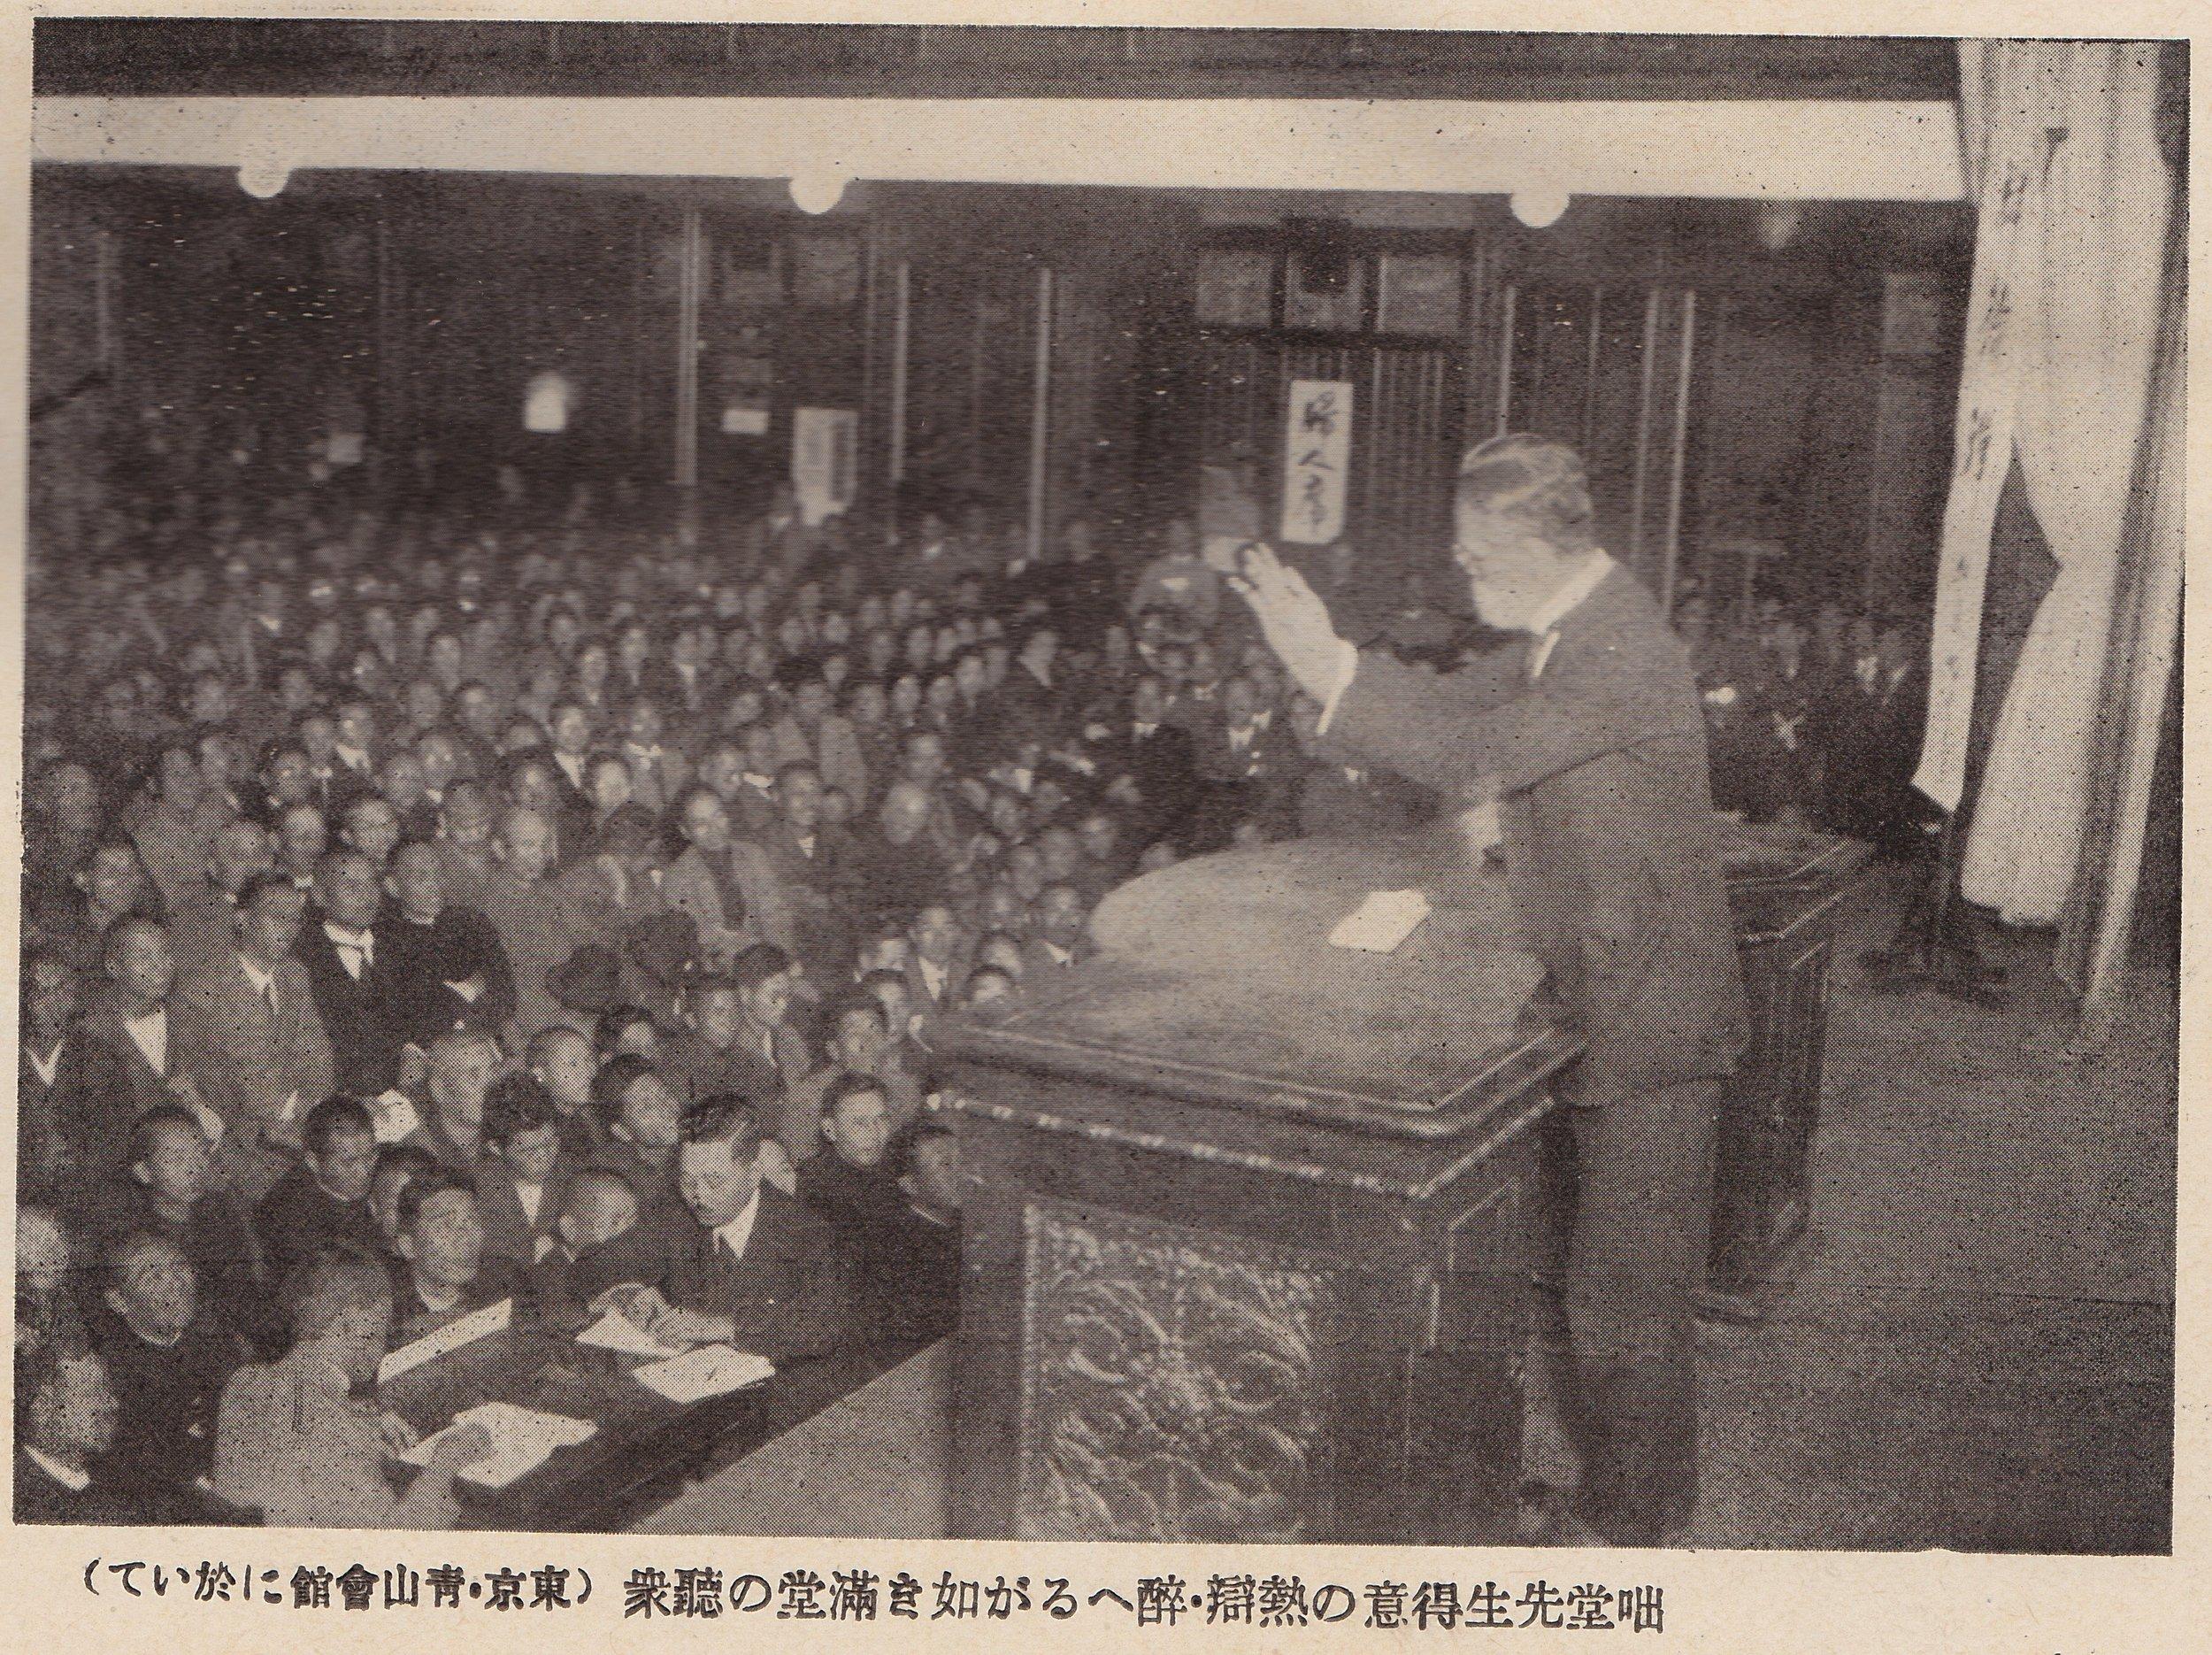 Katō Totsudō speaks to a rapt audience at Aoyama Hall.